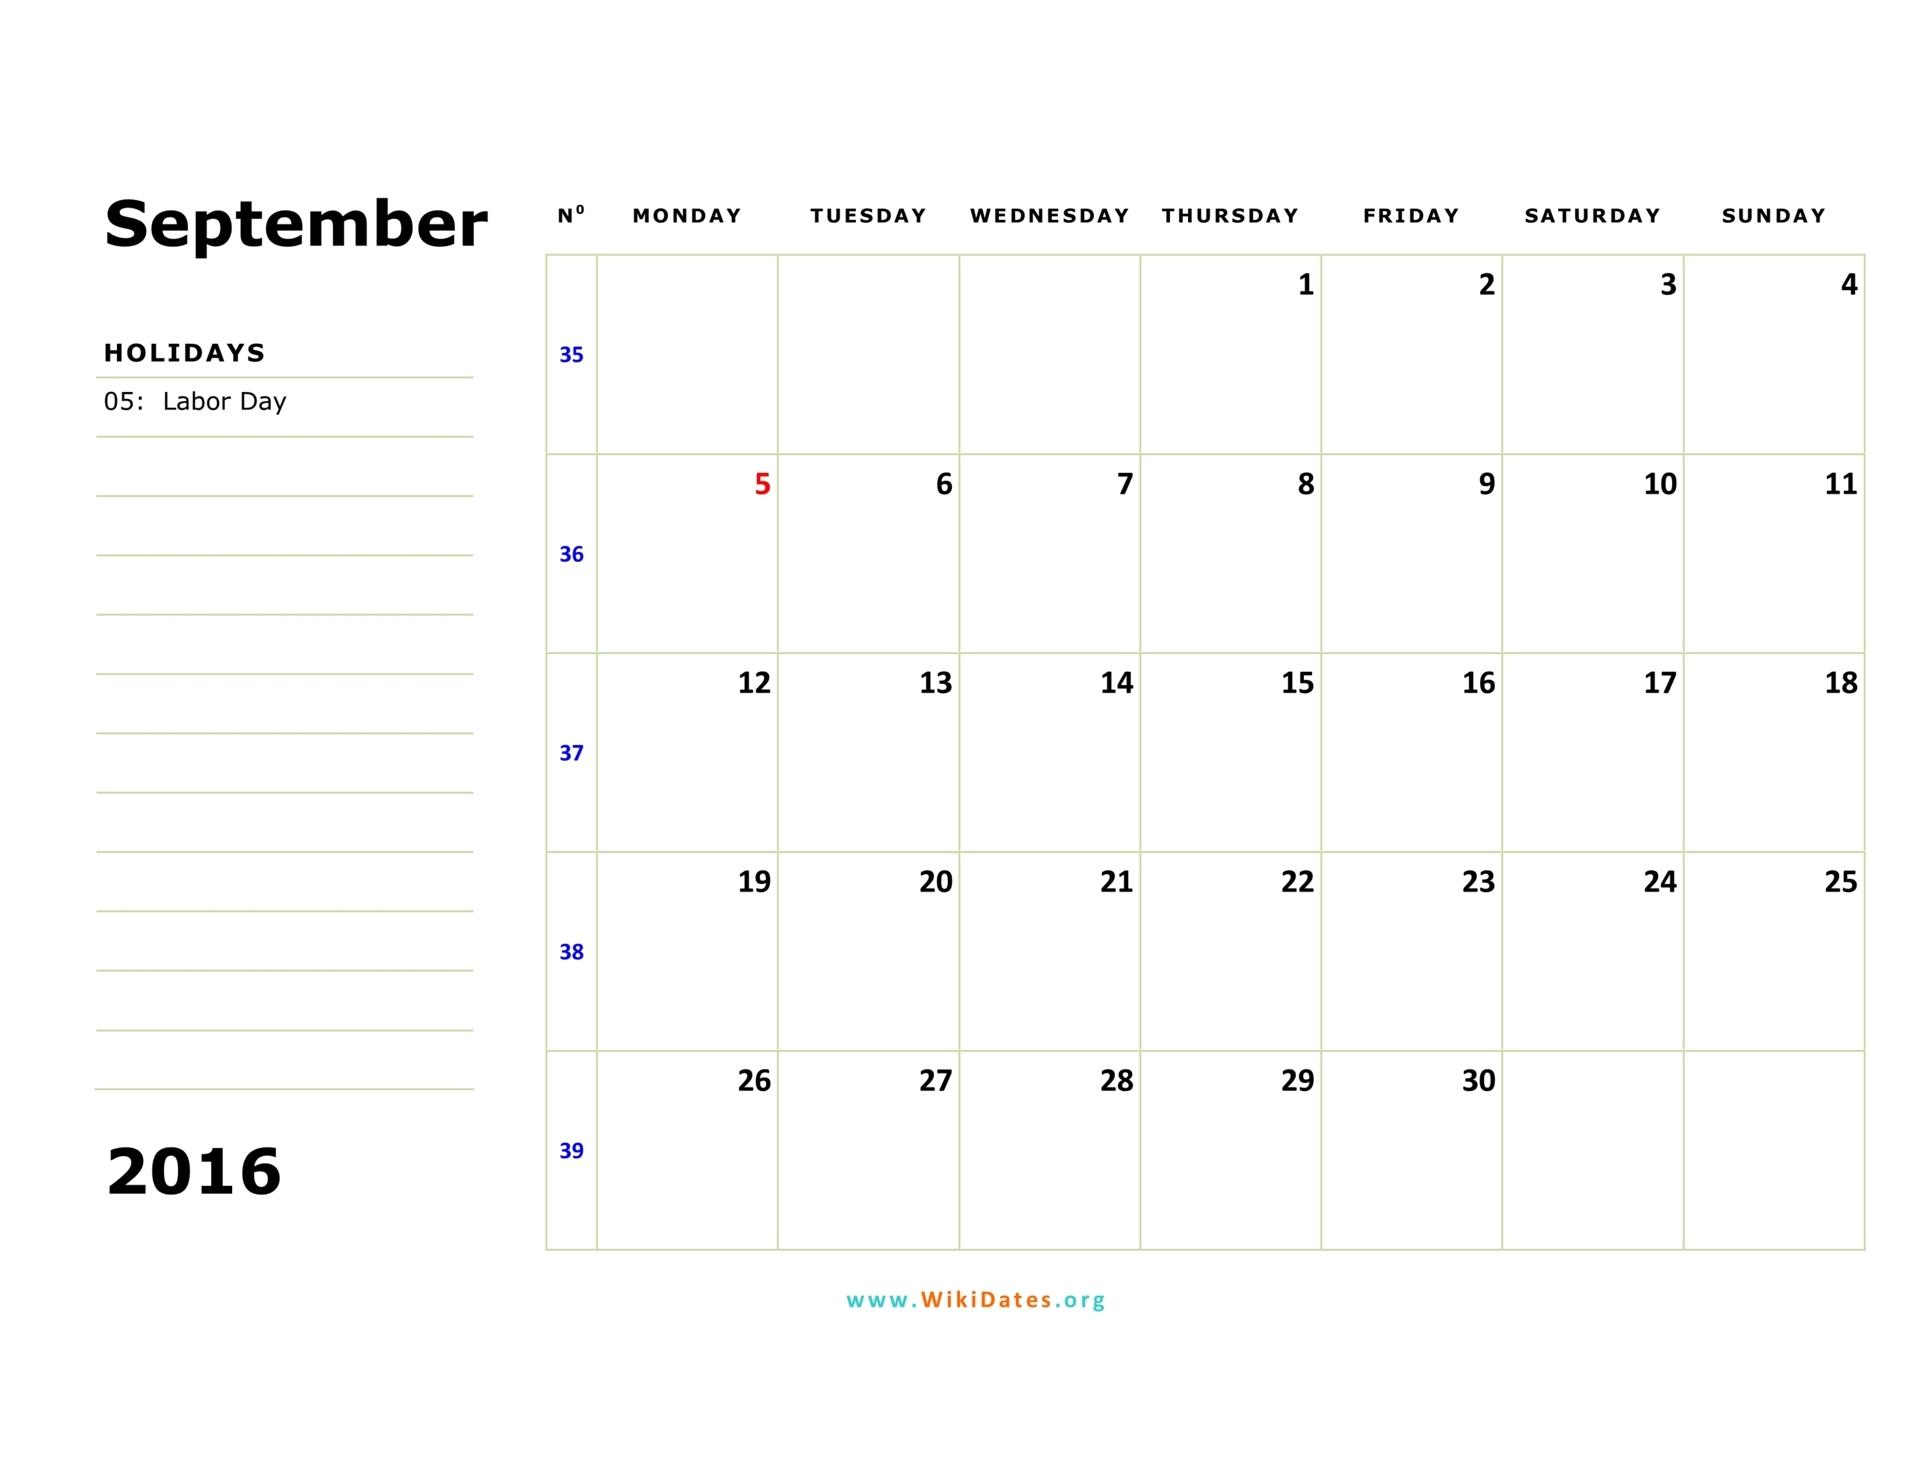 September 2016 Calendar | WikiDates.org